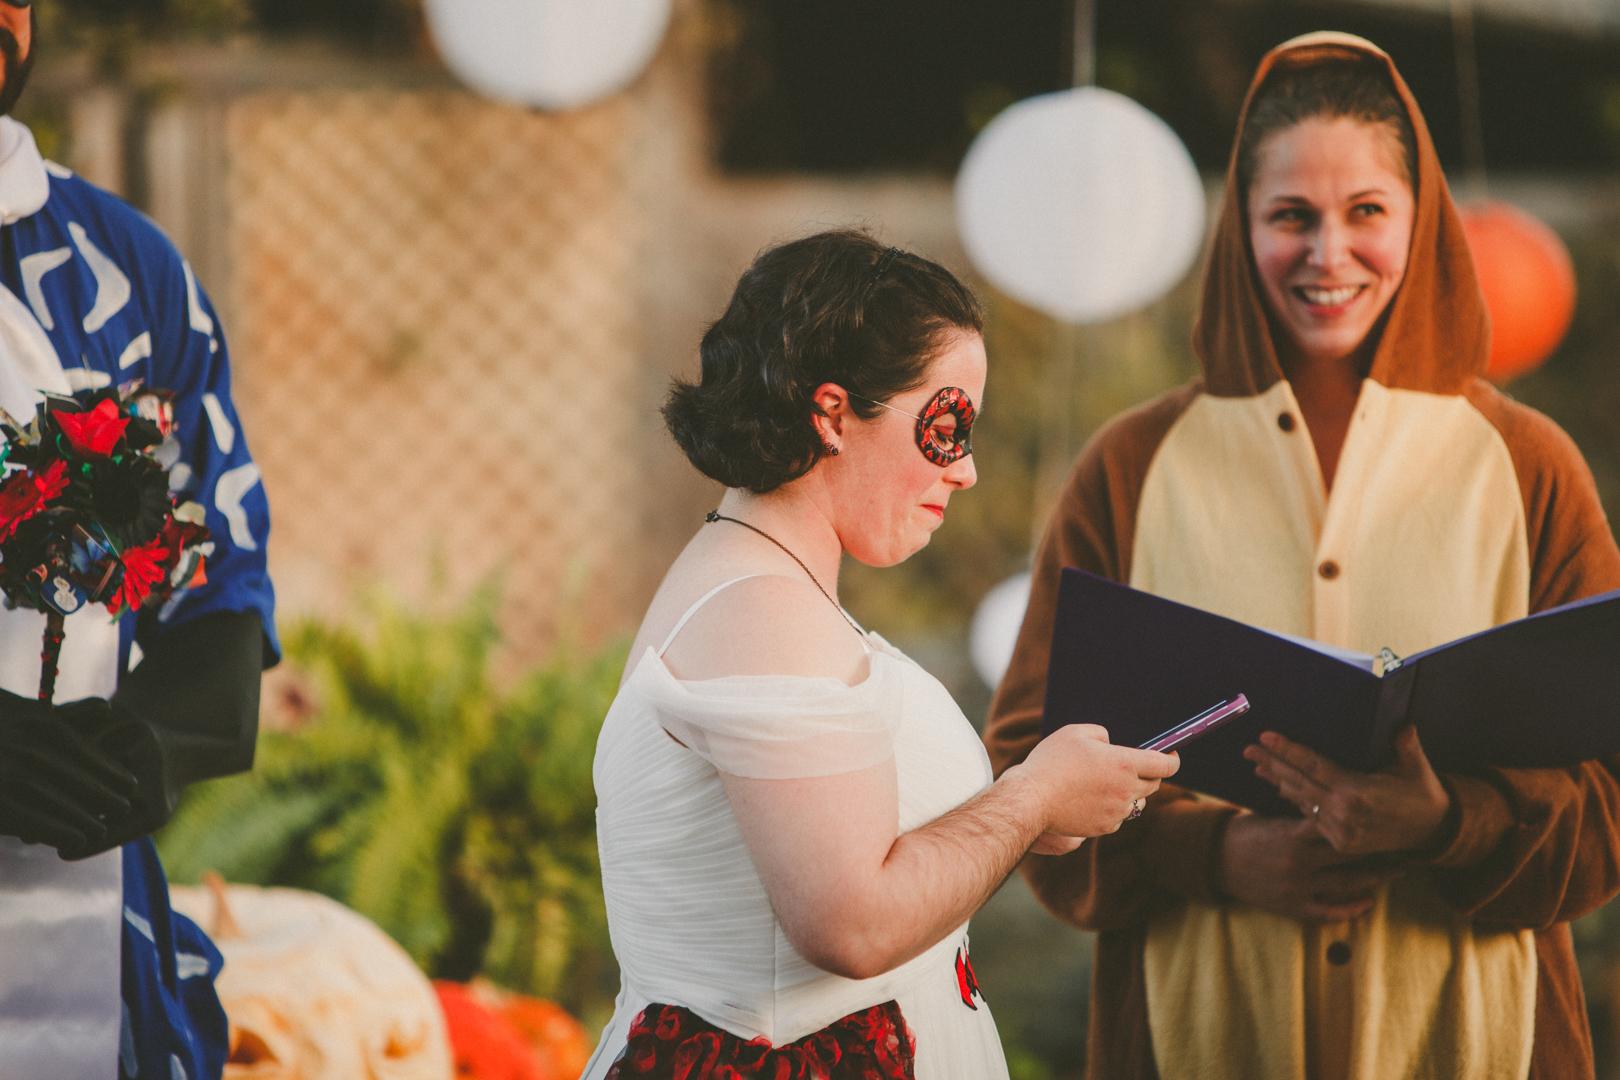 Mike&Hannah_HalloweenWedding-22.jpg